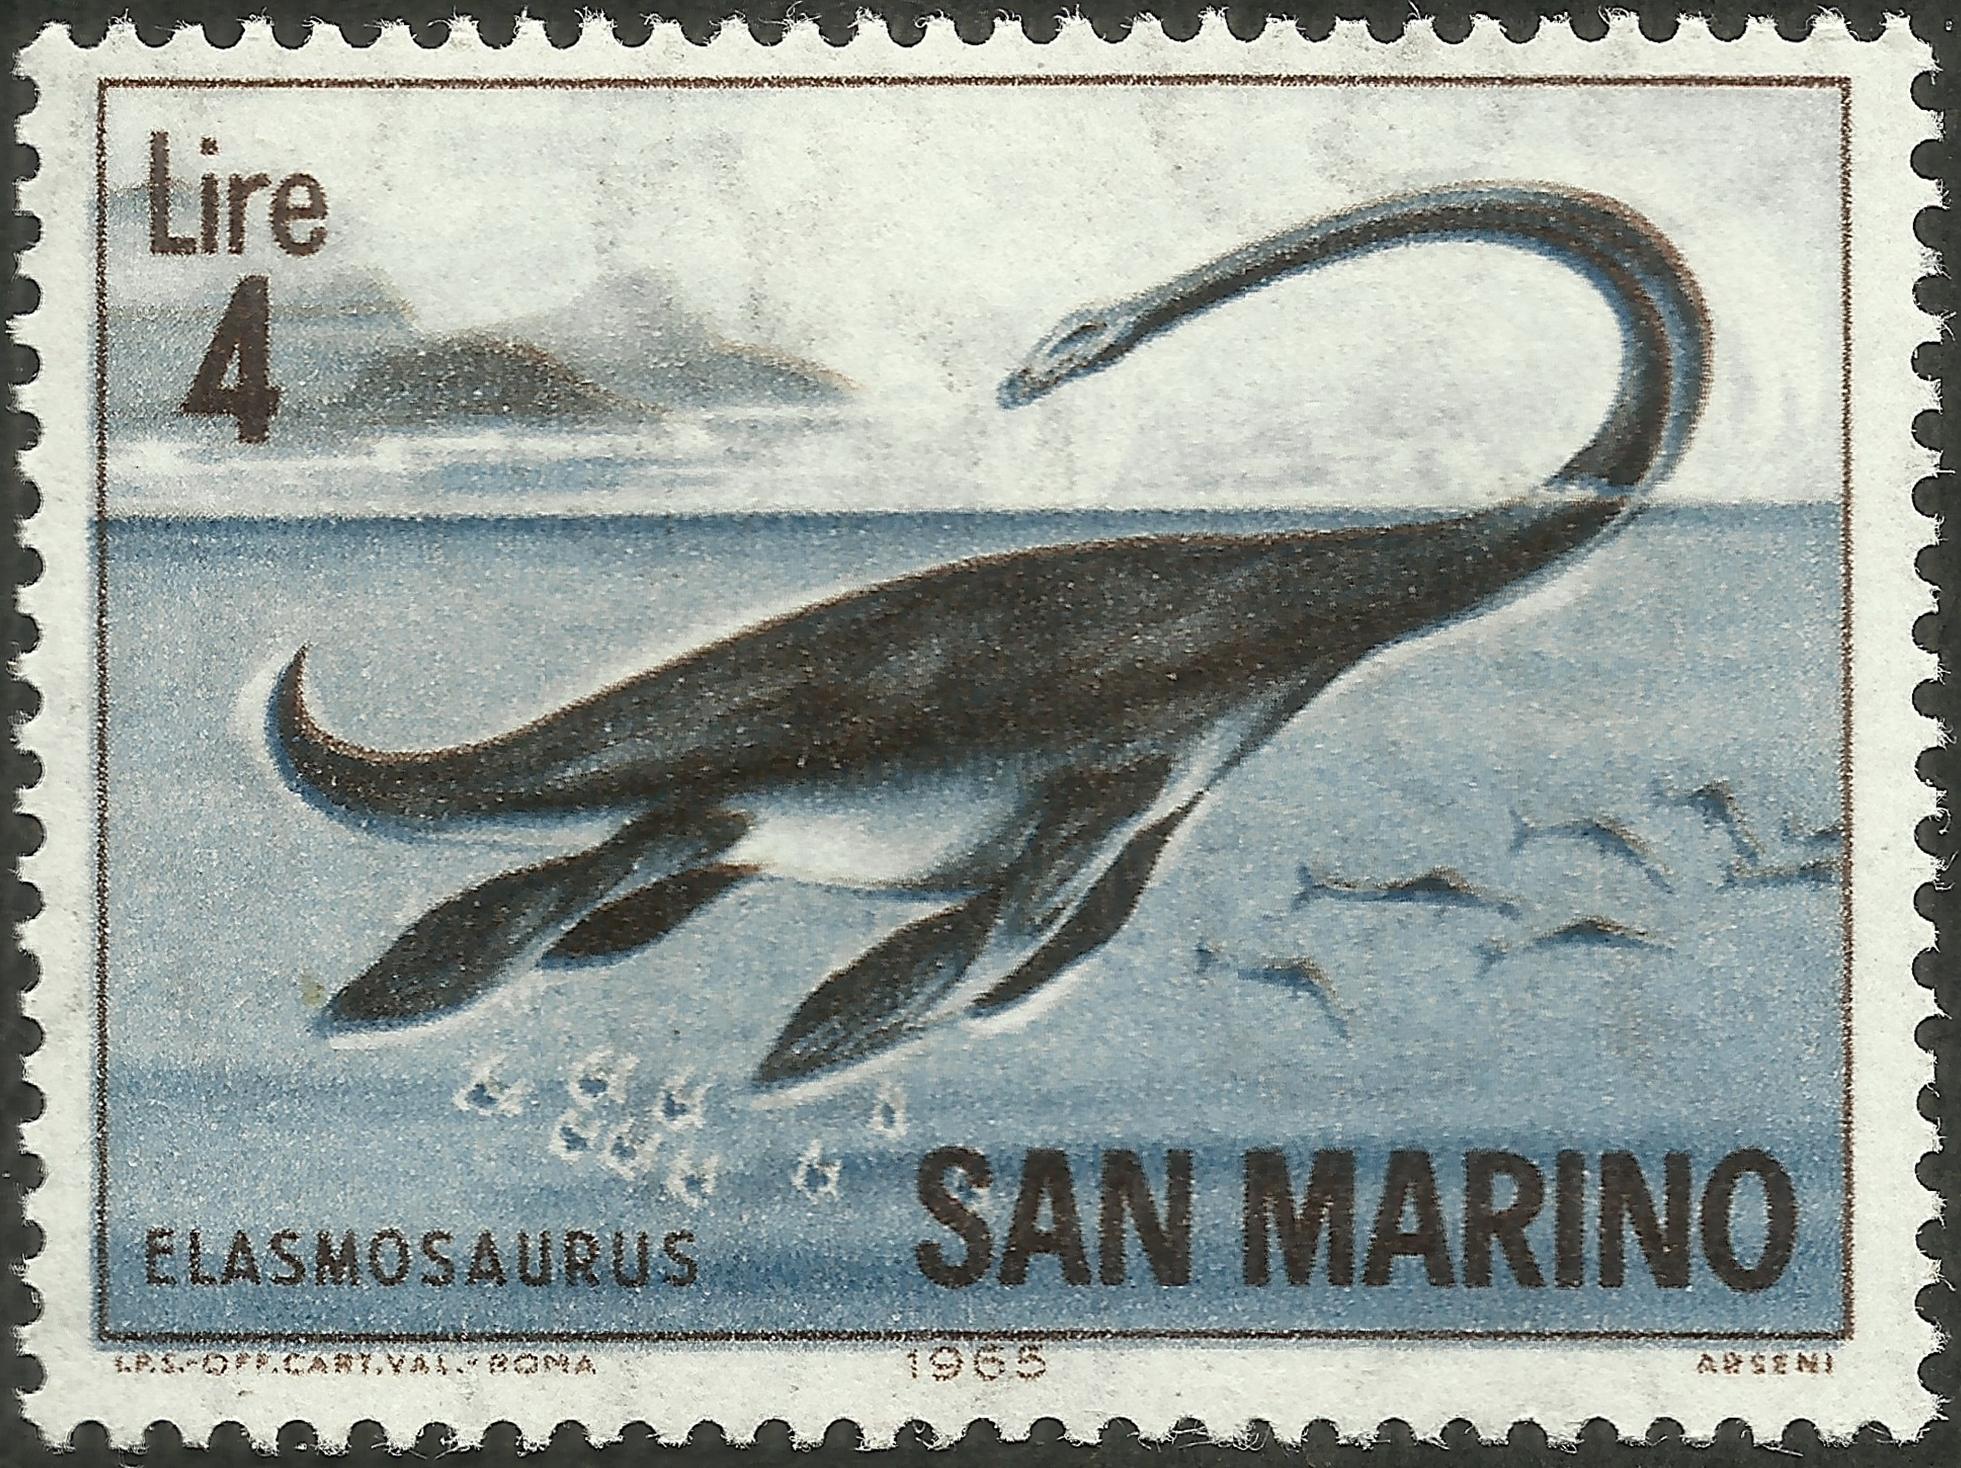 San Marino #615 (1966)